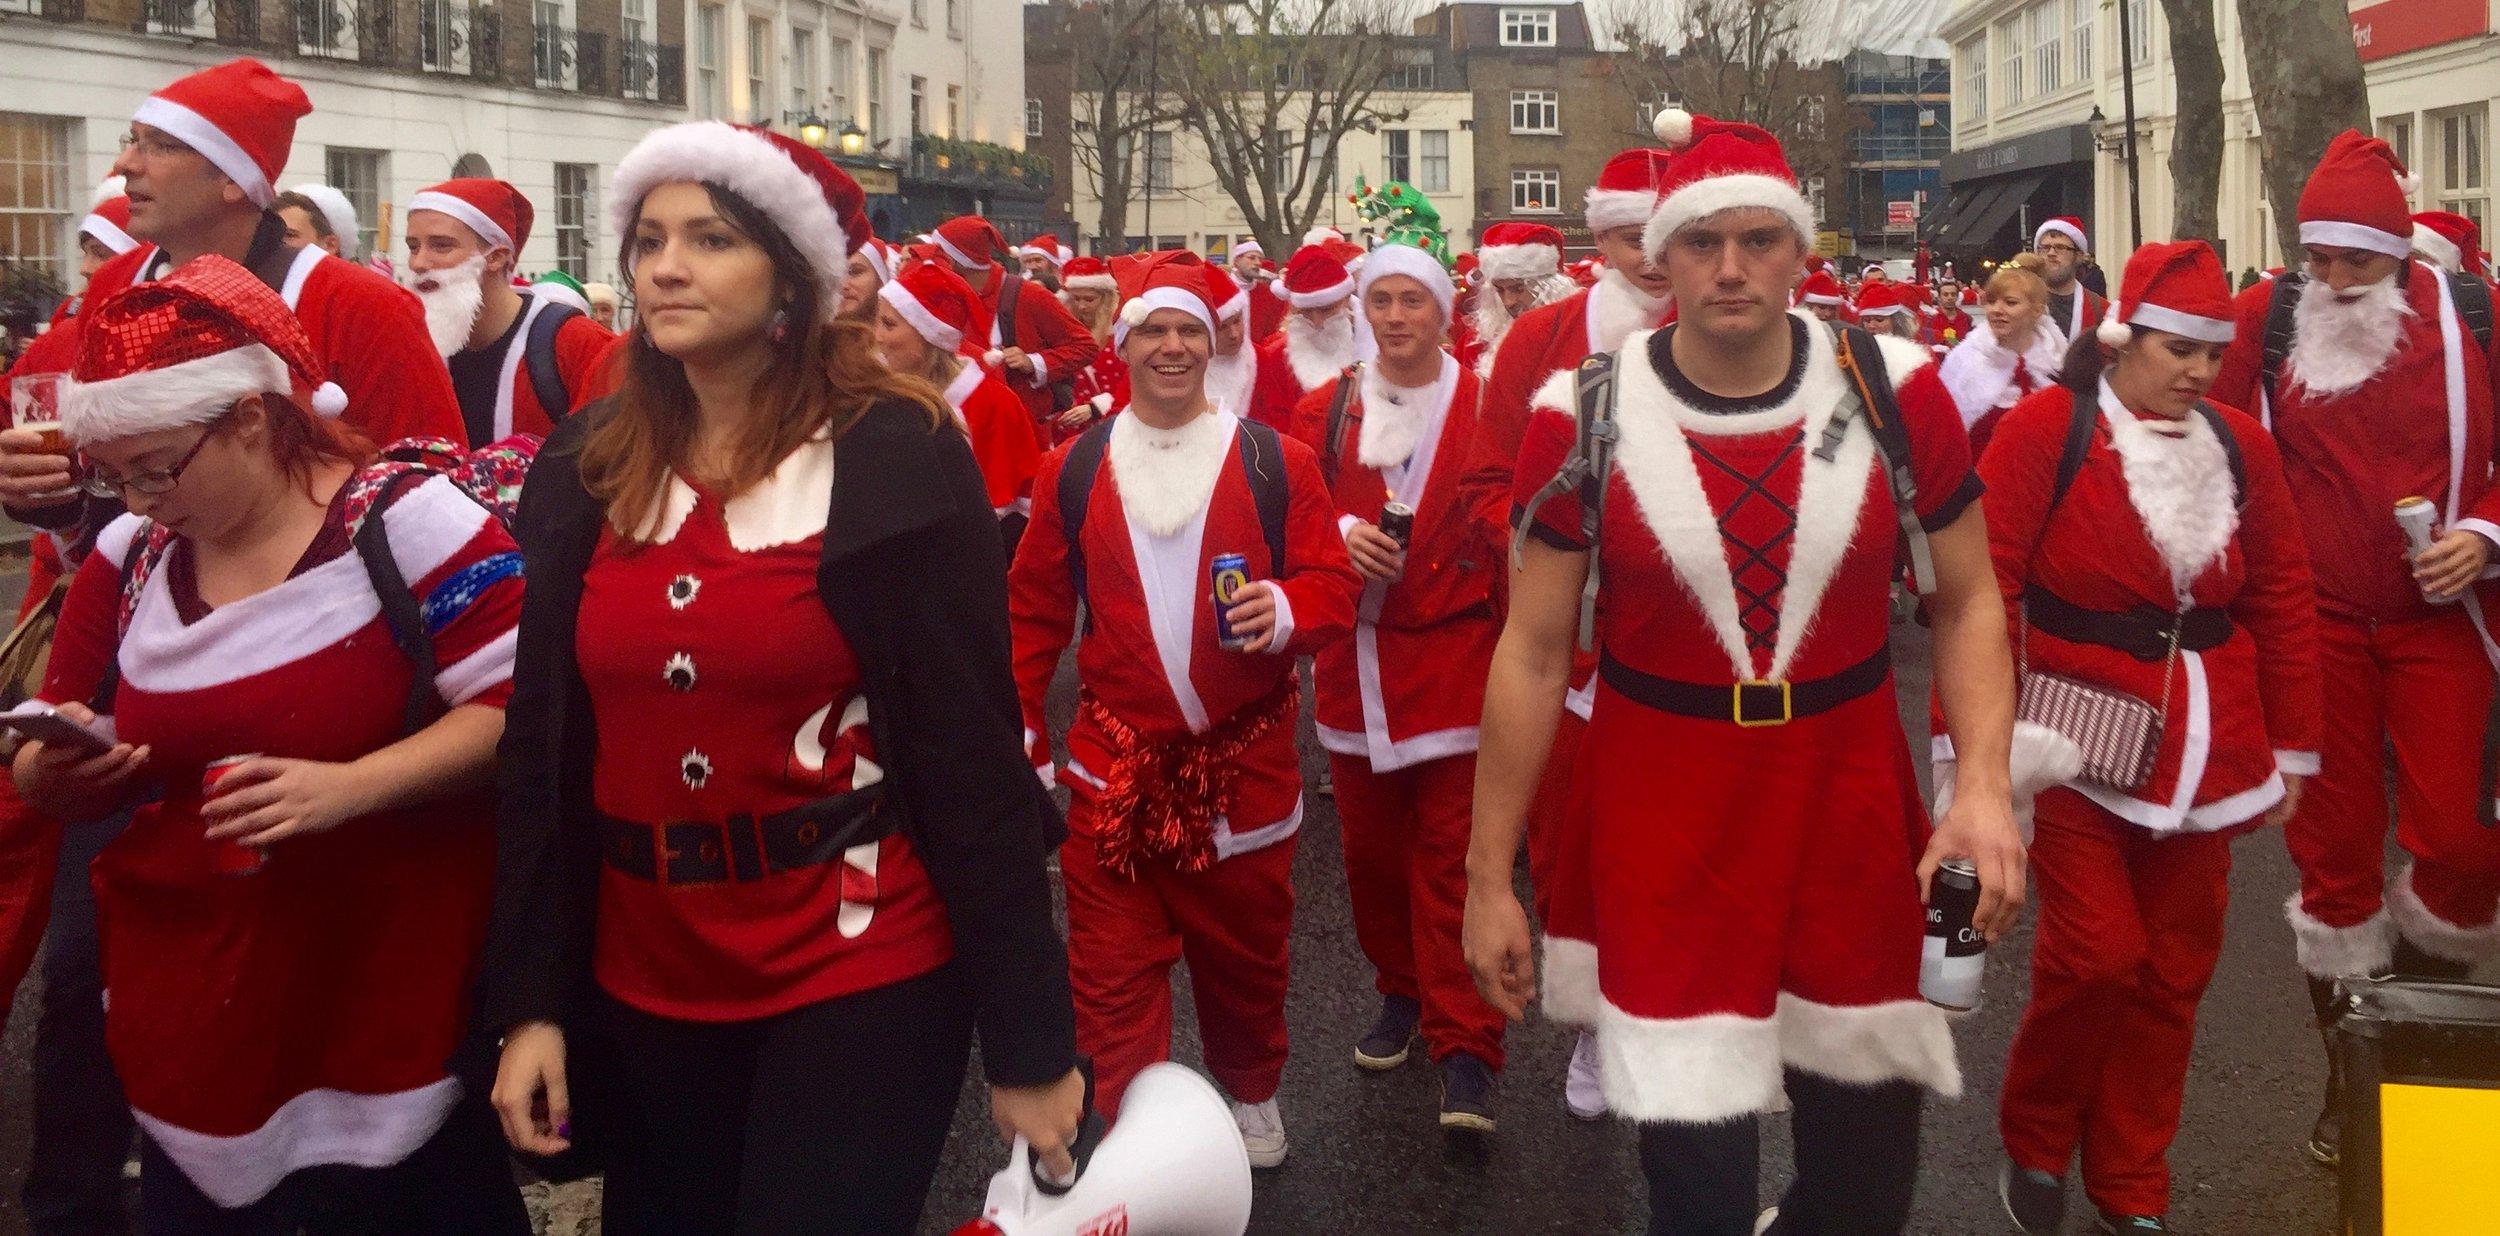 The Annual Santacon, London